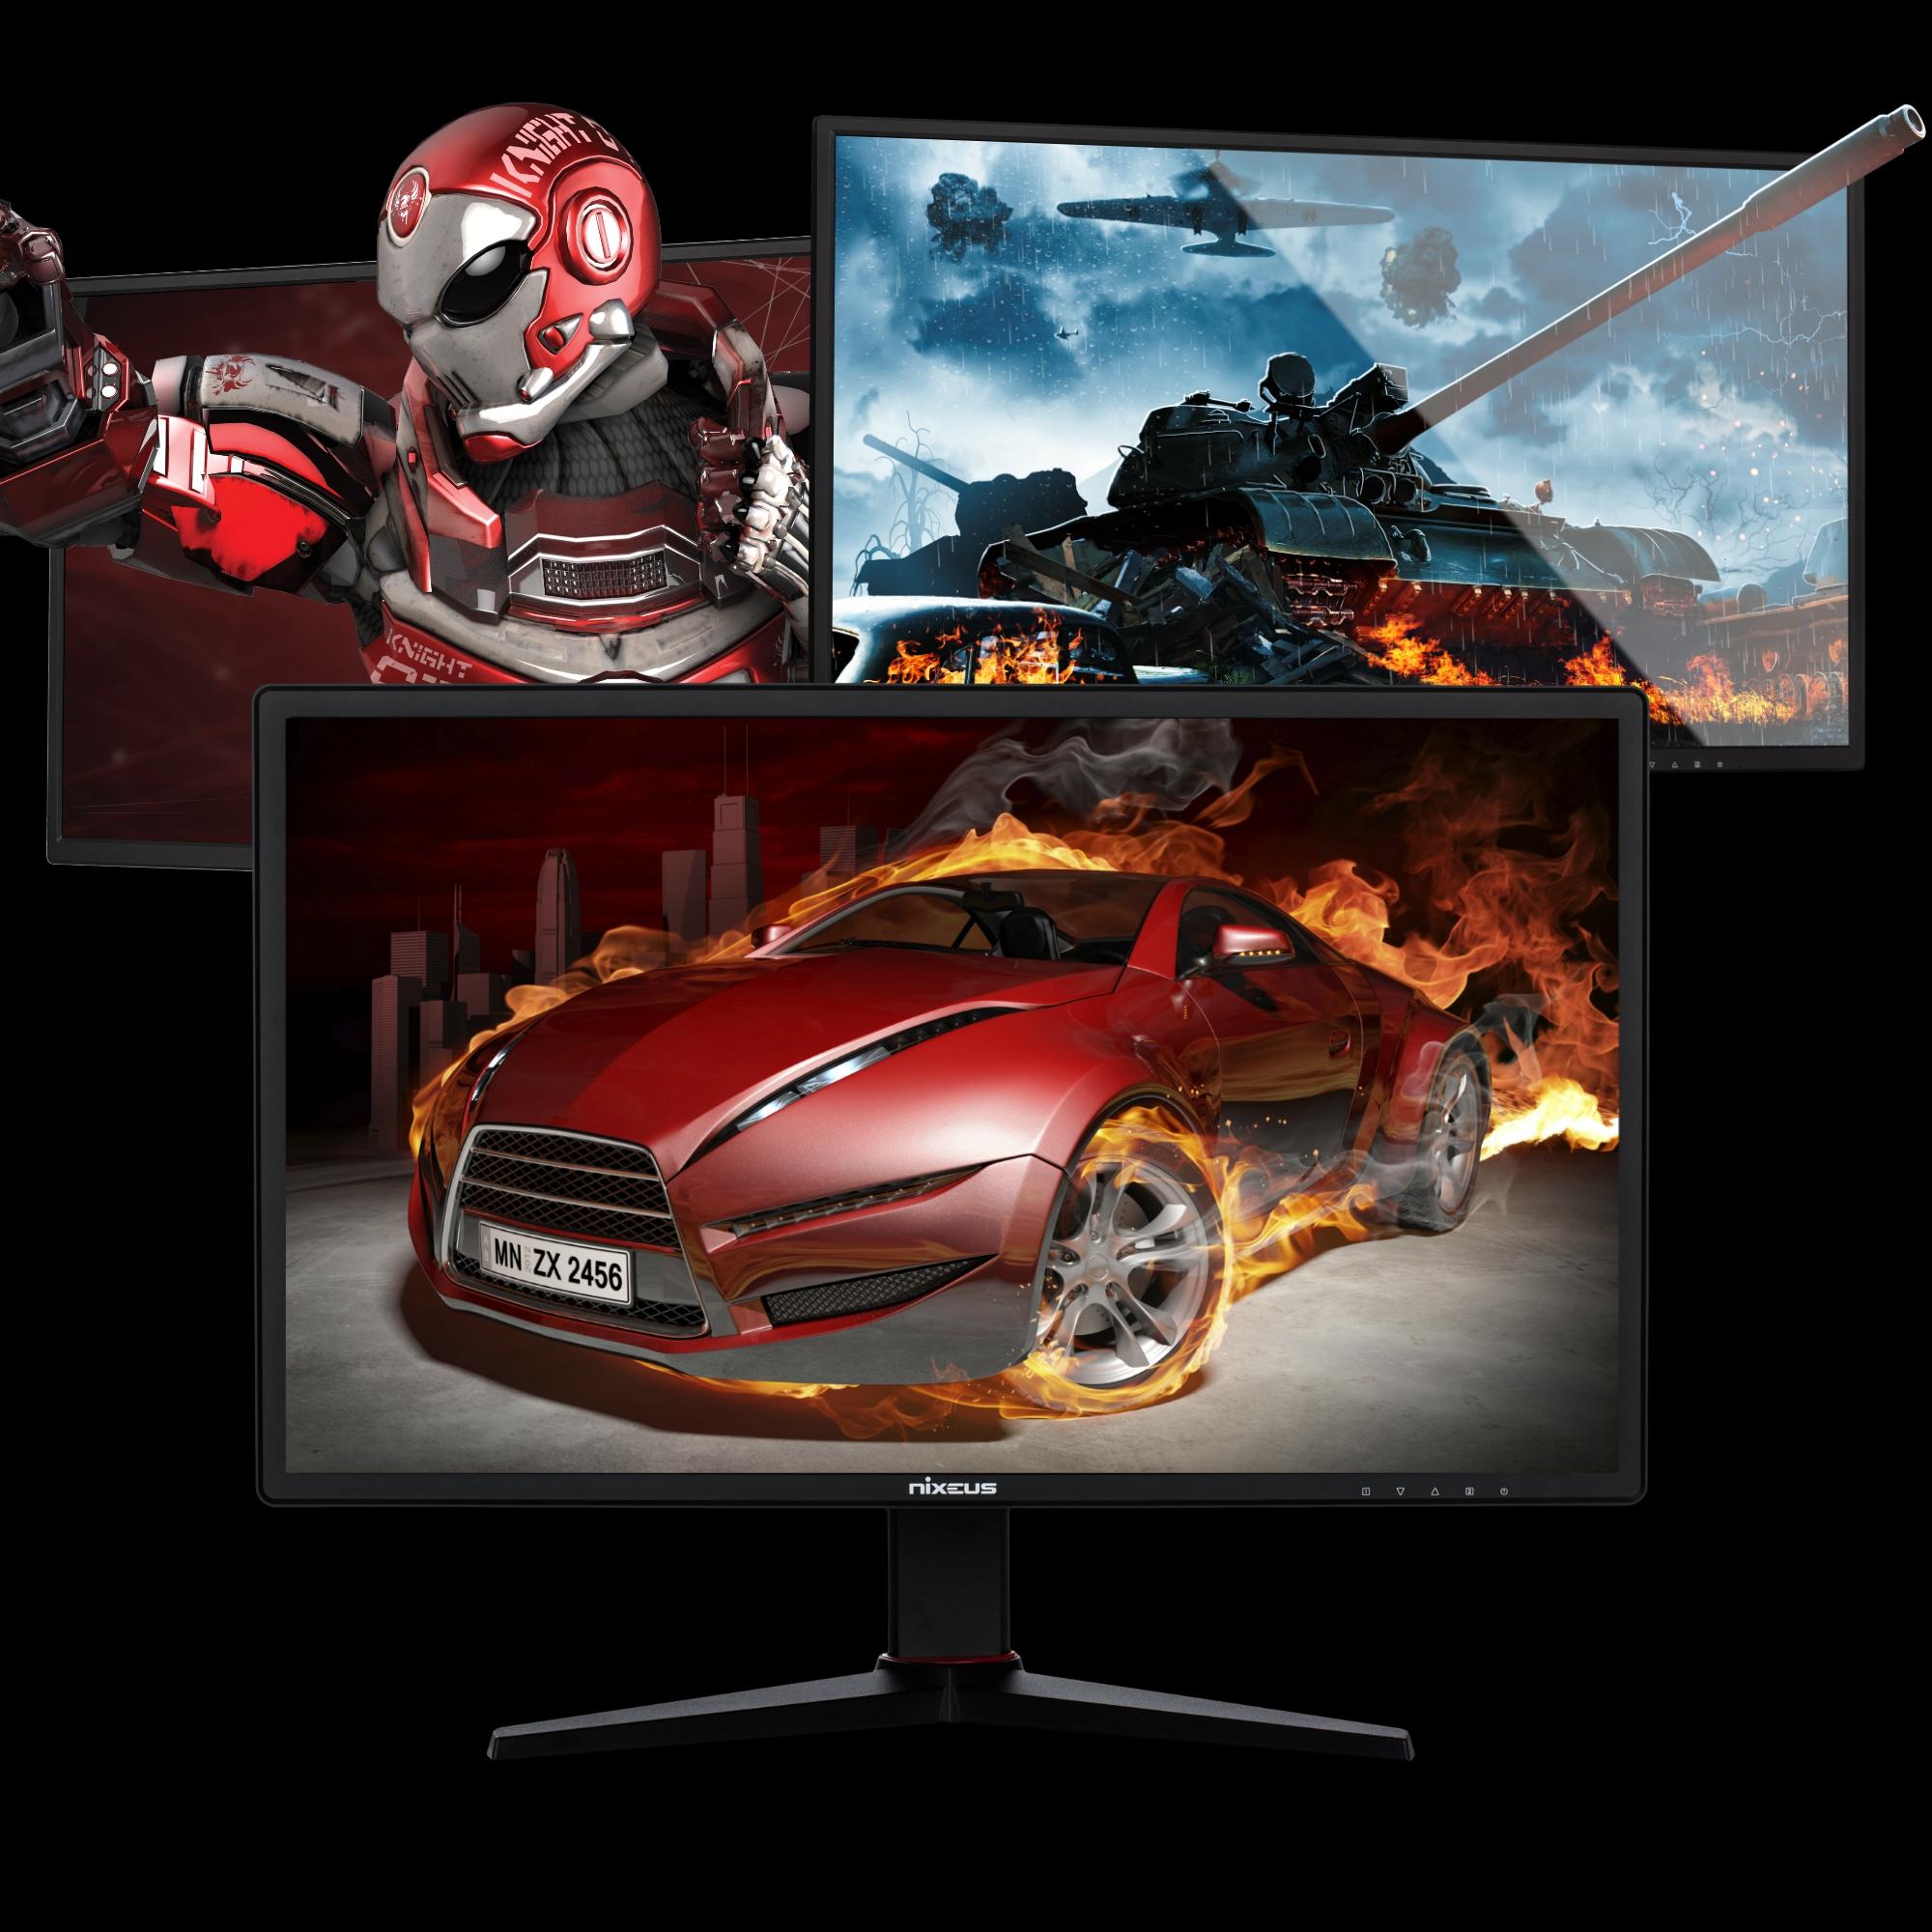 7-7-2019: Nixeus EDG Gaming Monitors Press Release